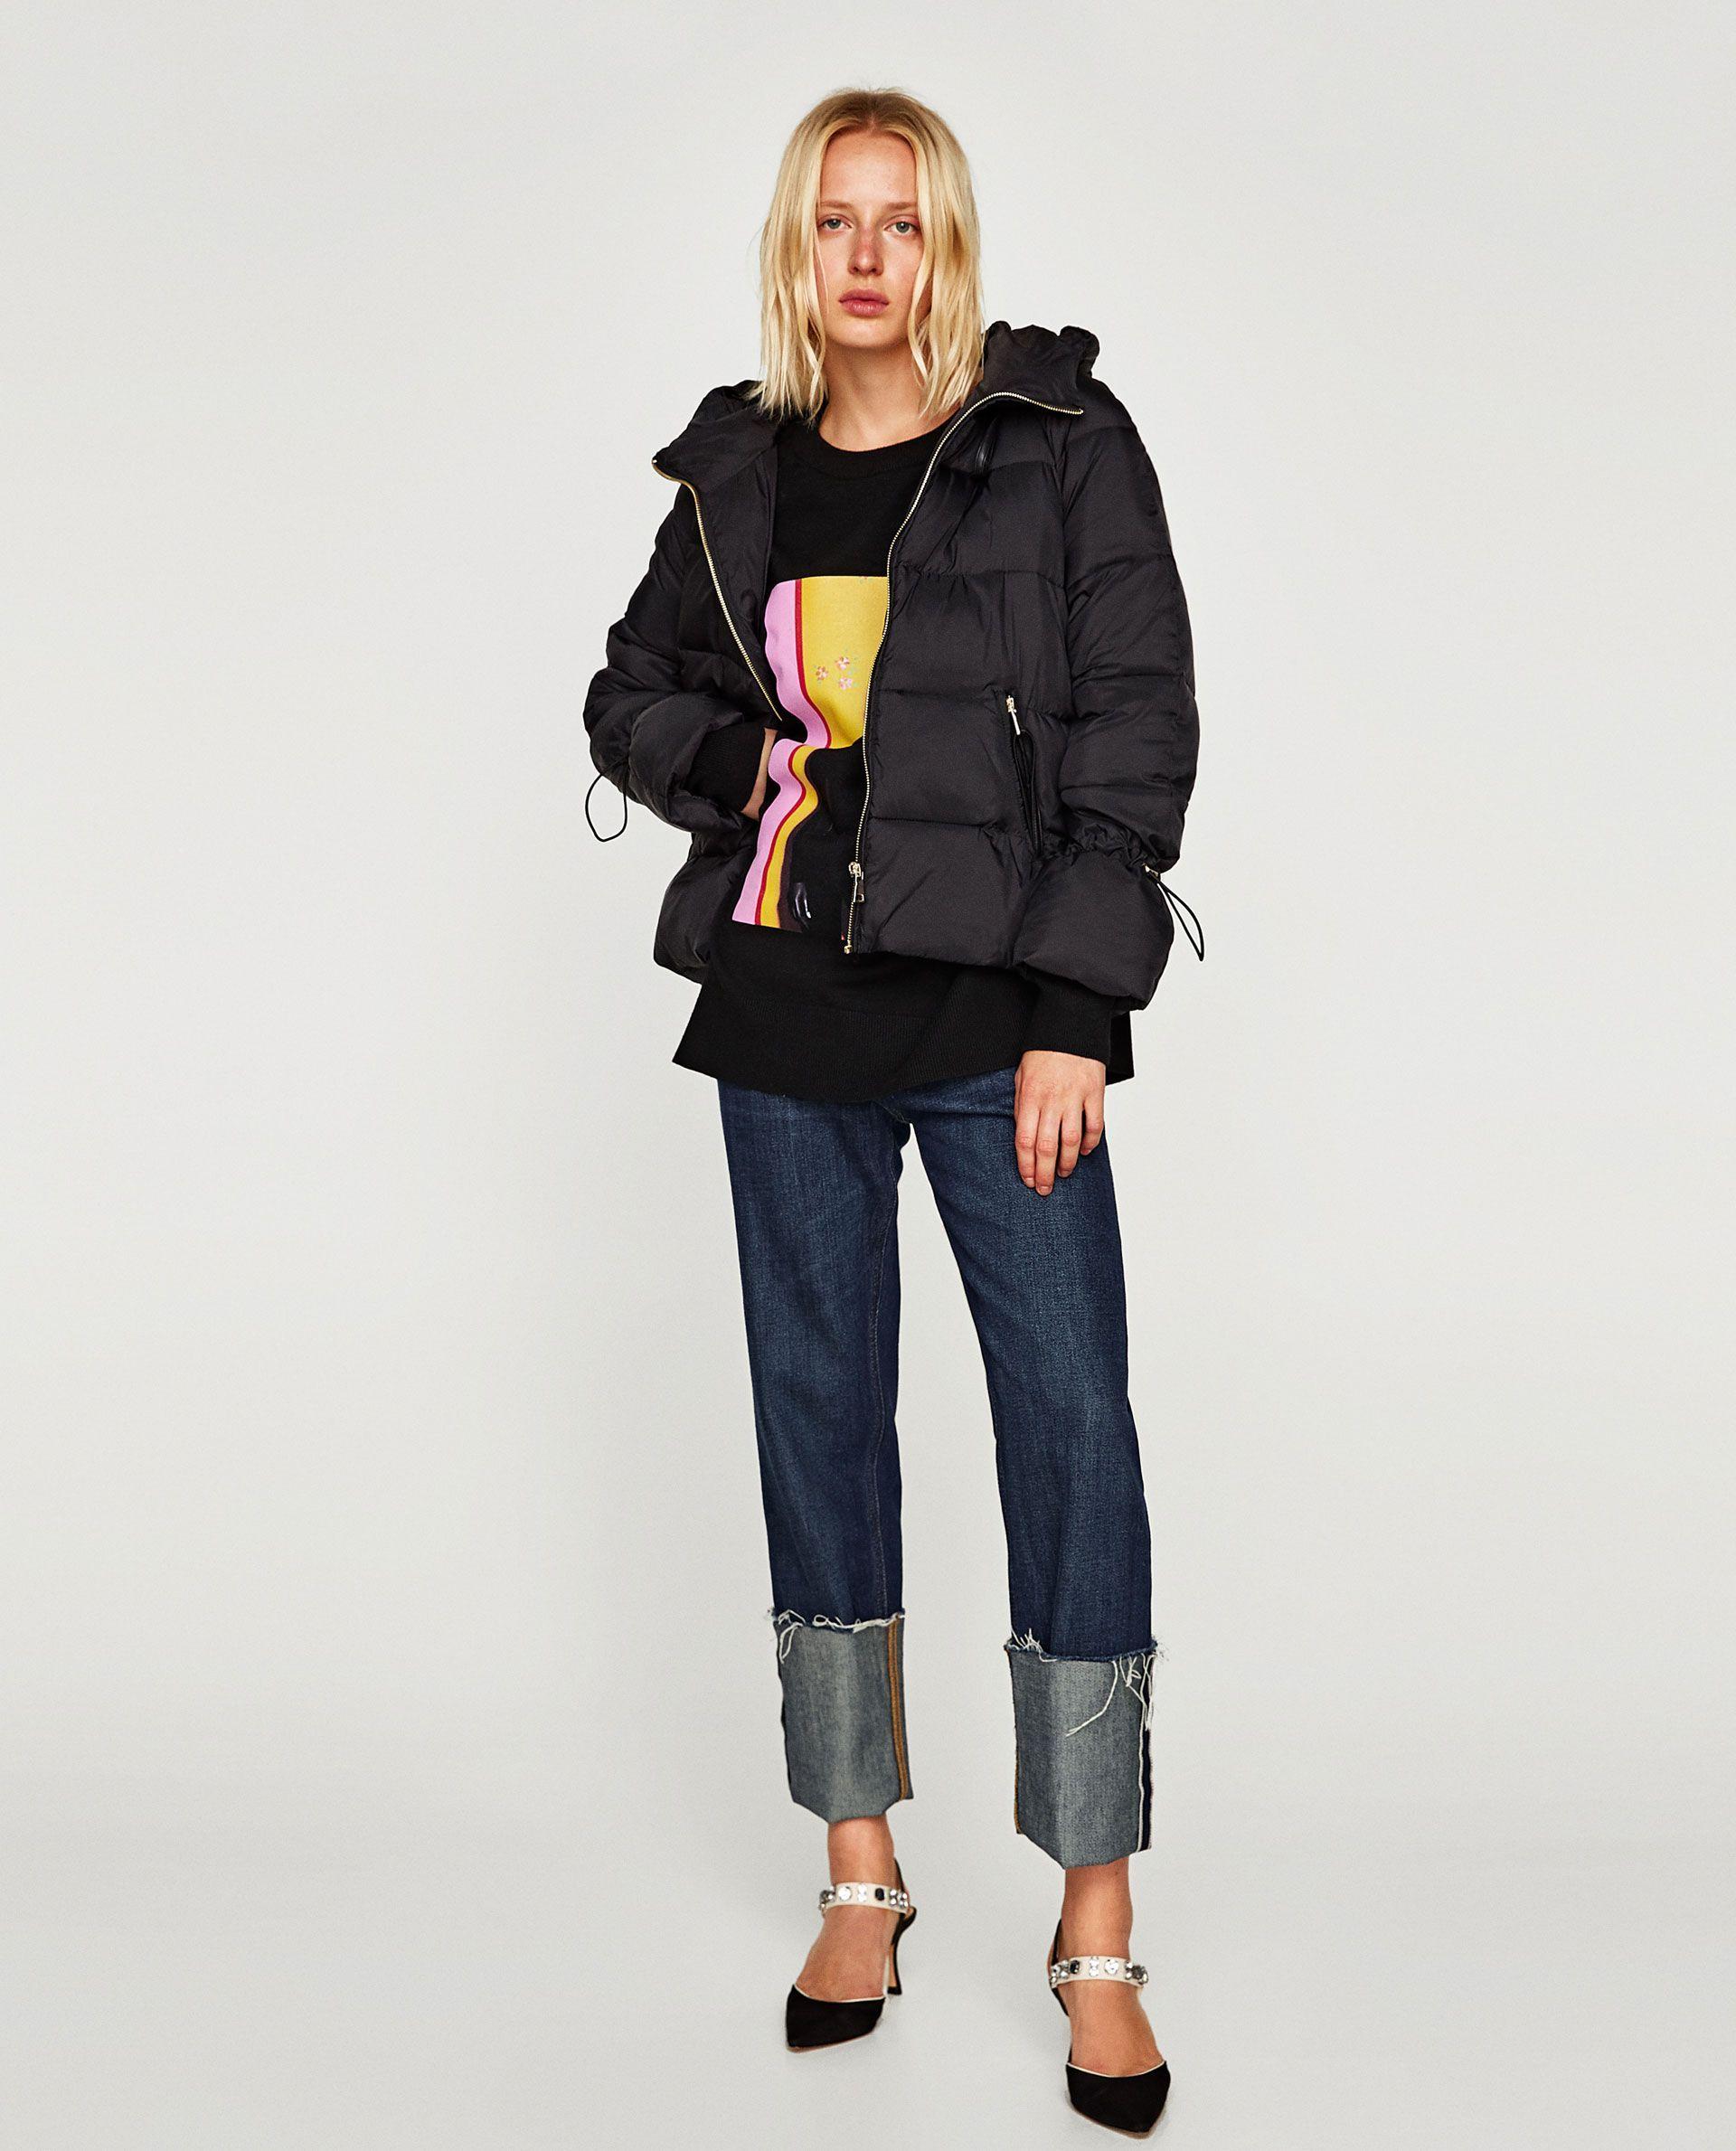 An Exhaustive List Of All The Puffer Coats To Buy At Zara Best Puffer Jacket Zara Jackets [ 2379 x 1920 Pixel ]